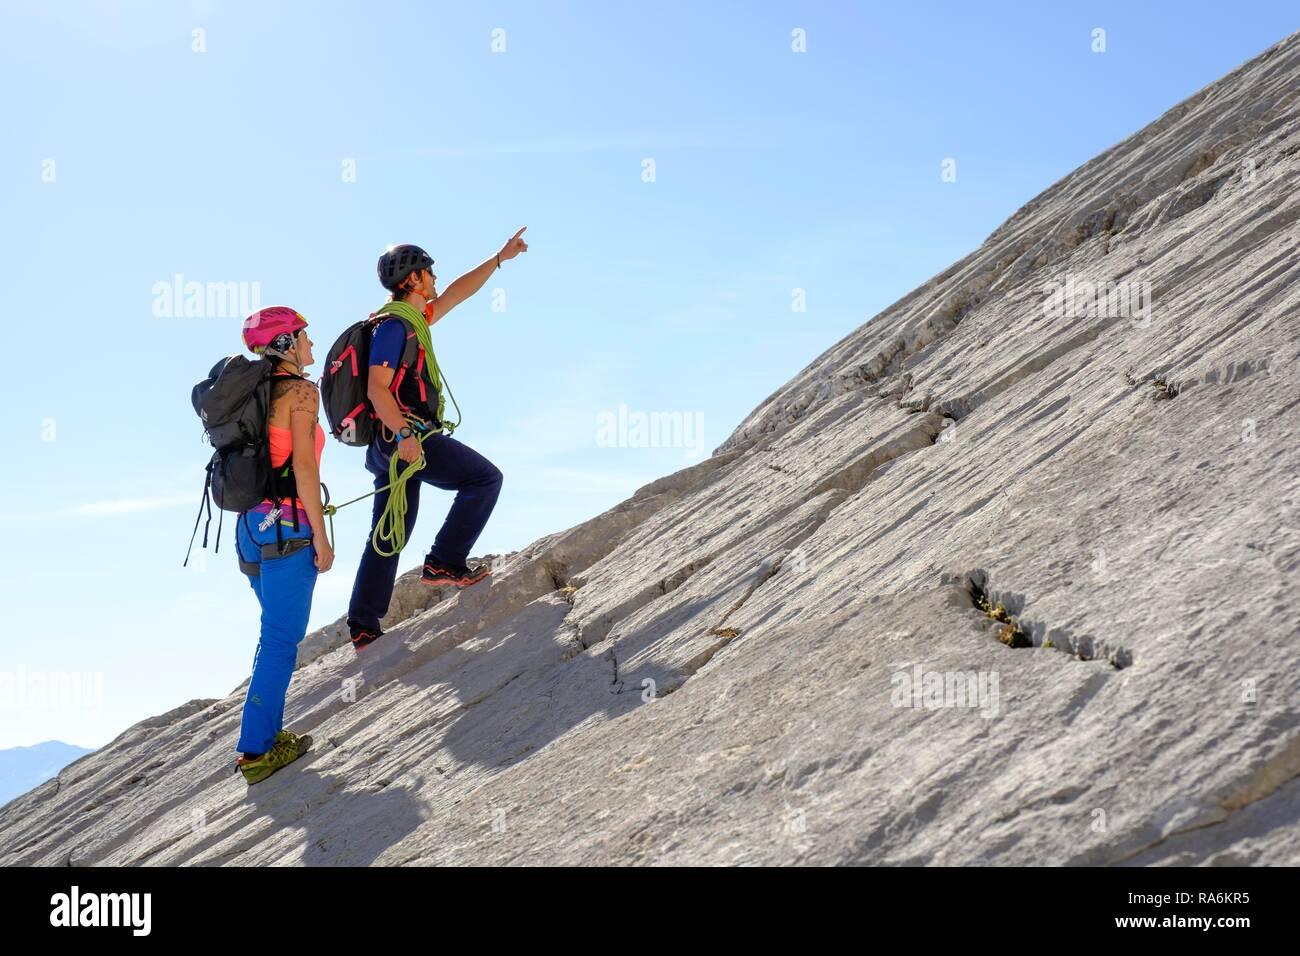 Mountain guide guiding a young woman on a short rope through a rock face, Wiederroute, Watzmann, Schönau am Königssee - Stock Image